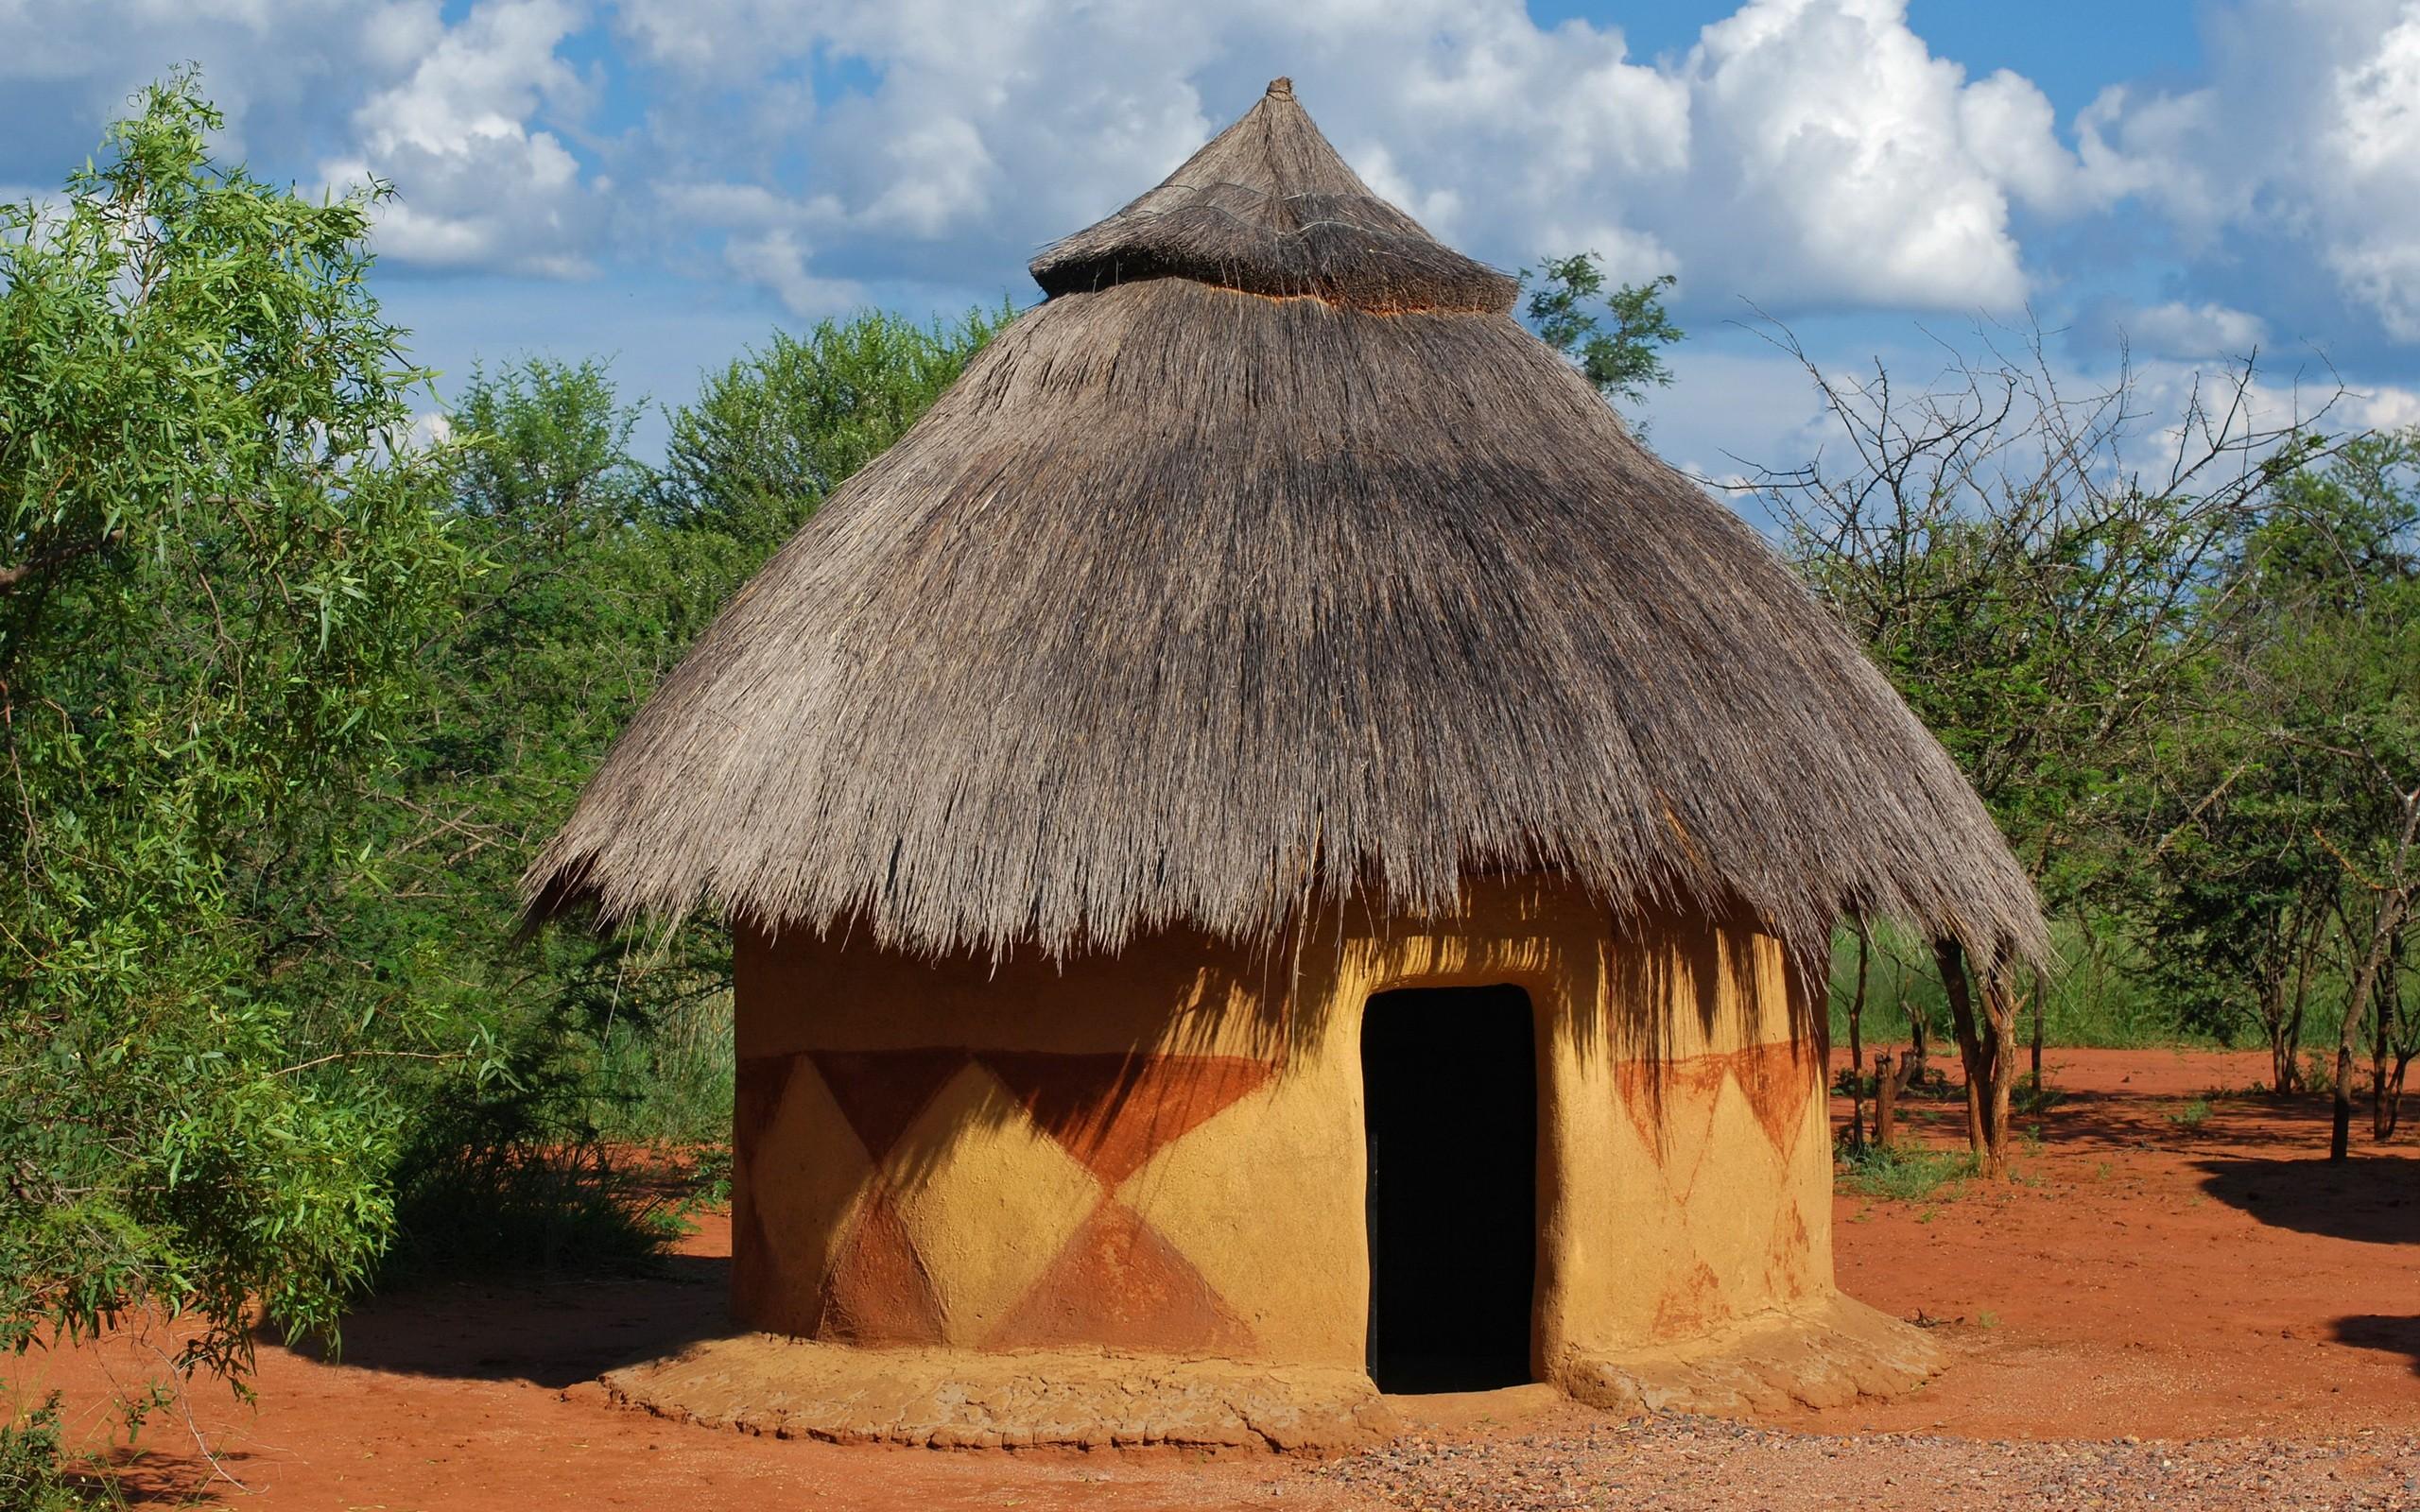 Choza tradicional de paja - 2560x1600